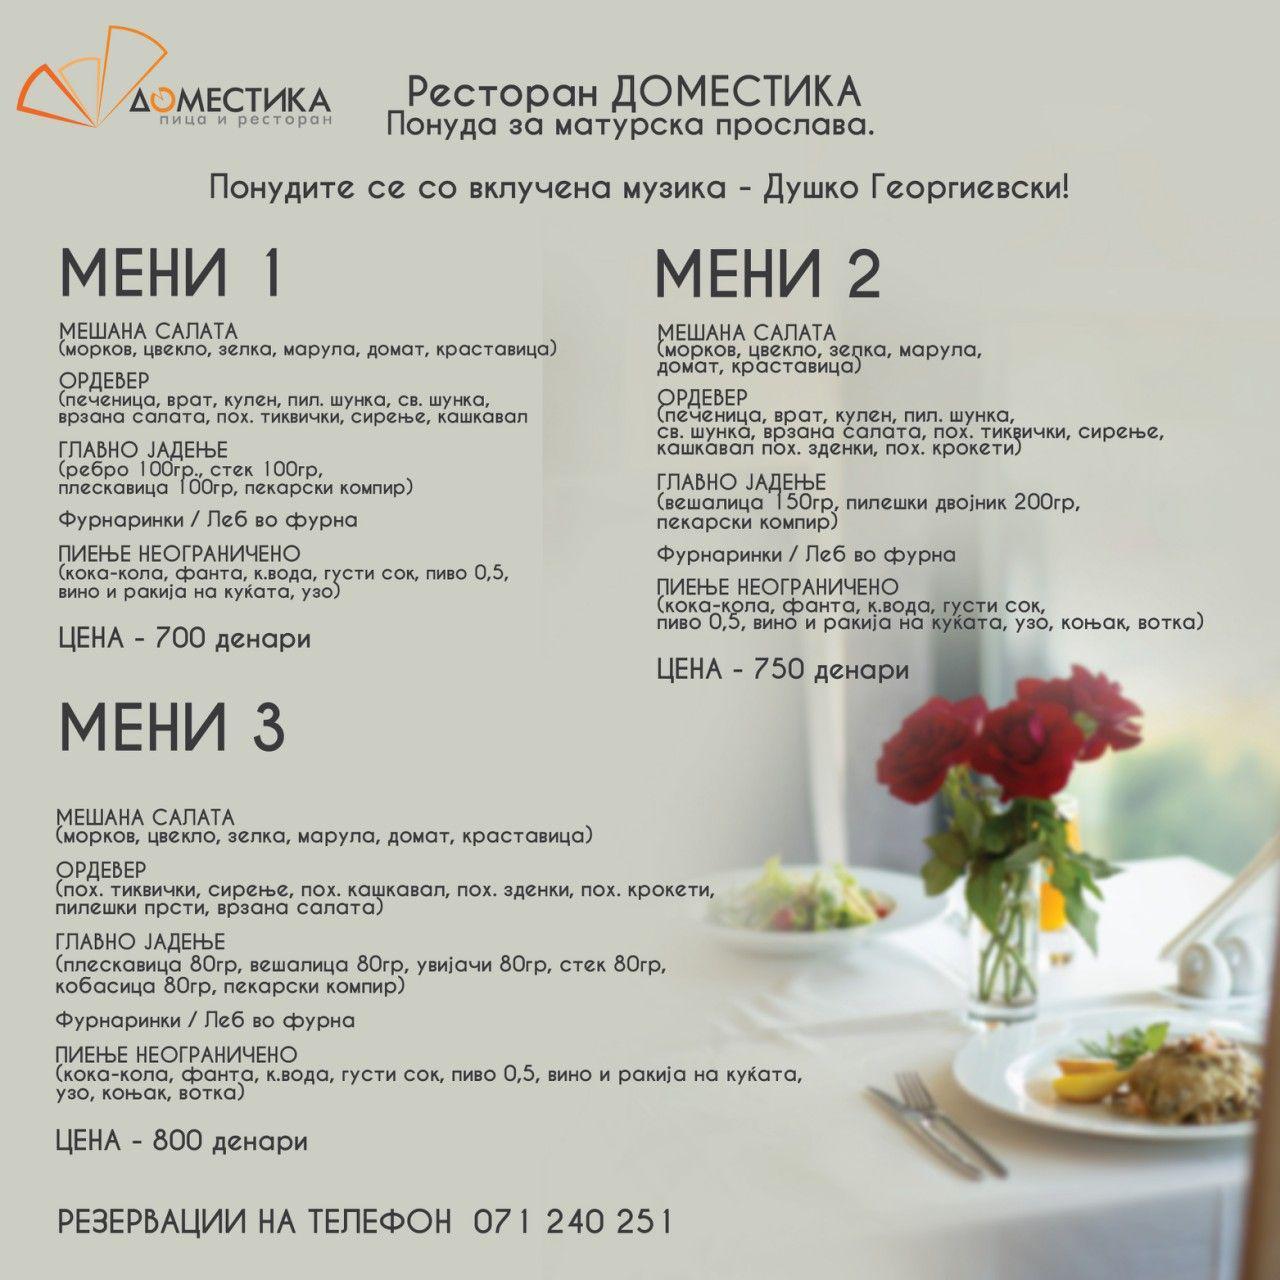 Restaurant Domestika Skopje